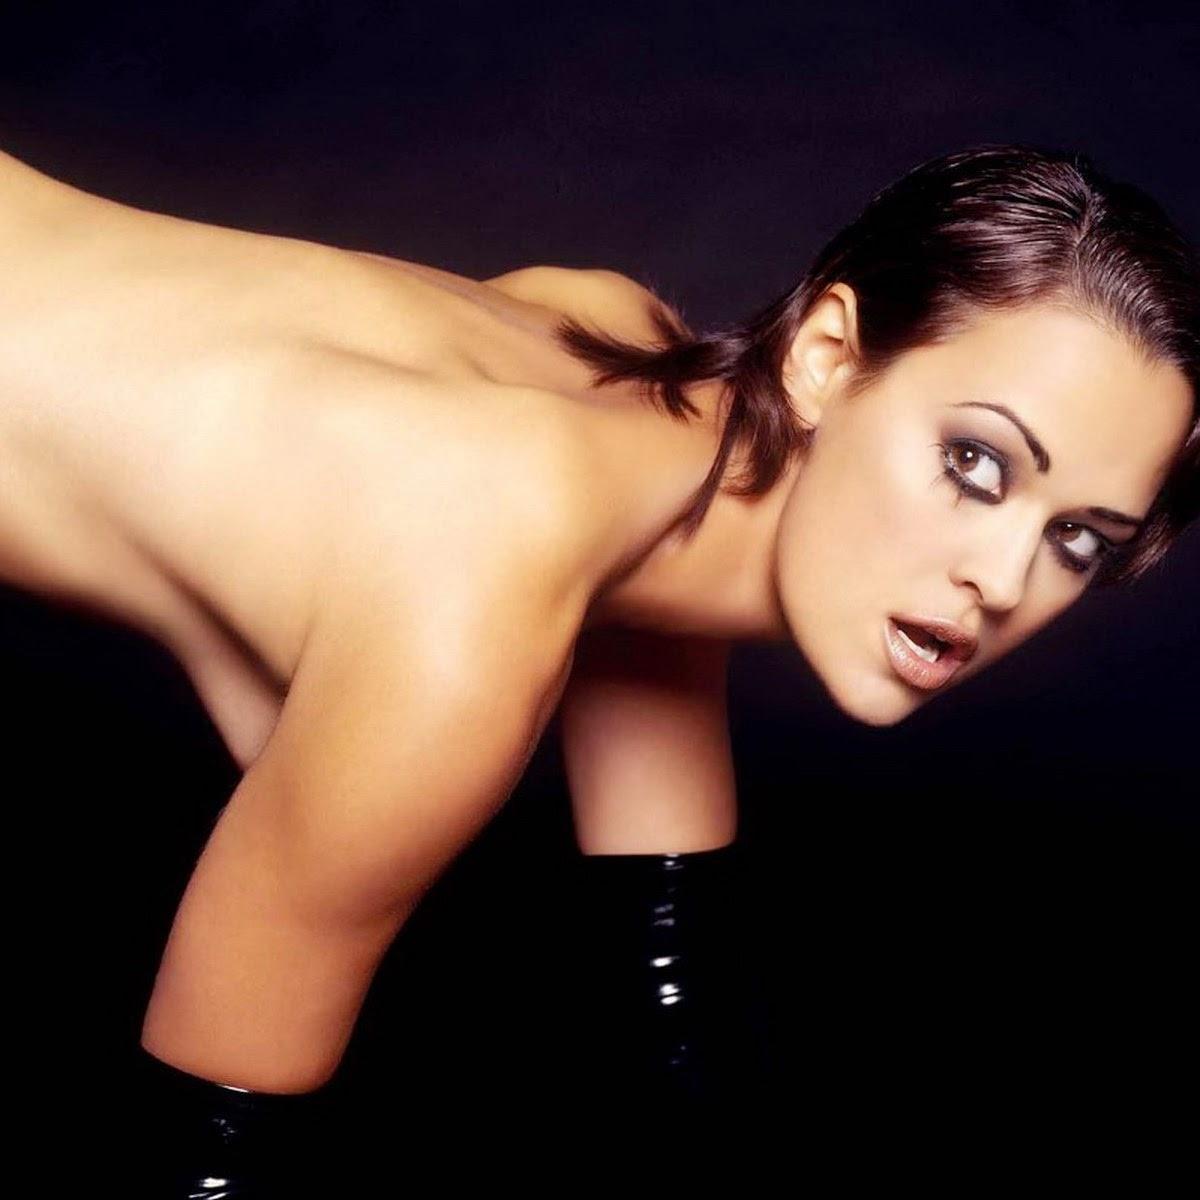 Sydney penny nude